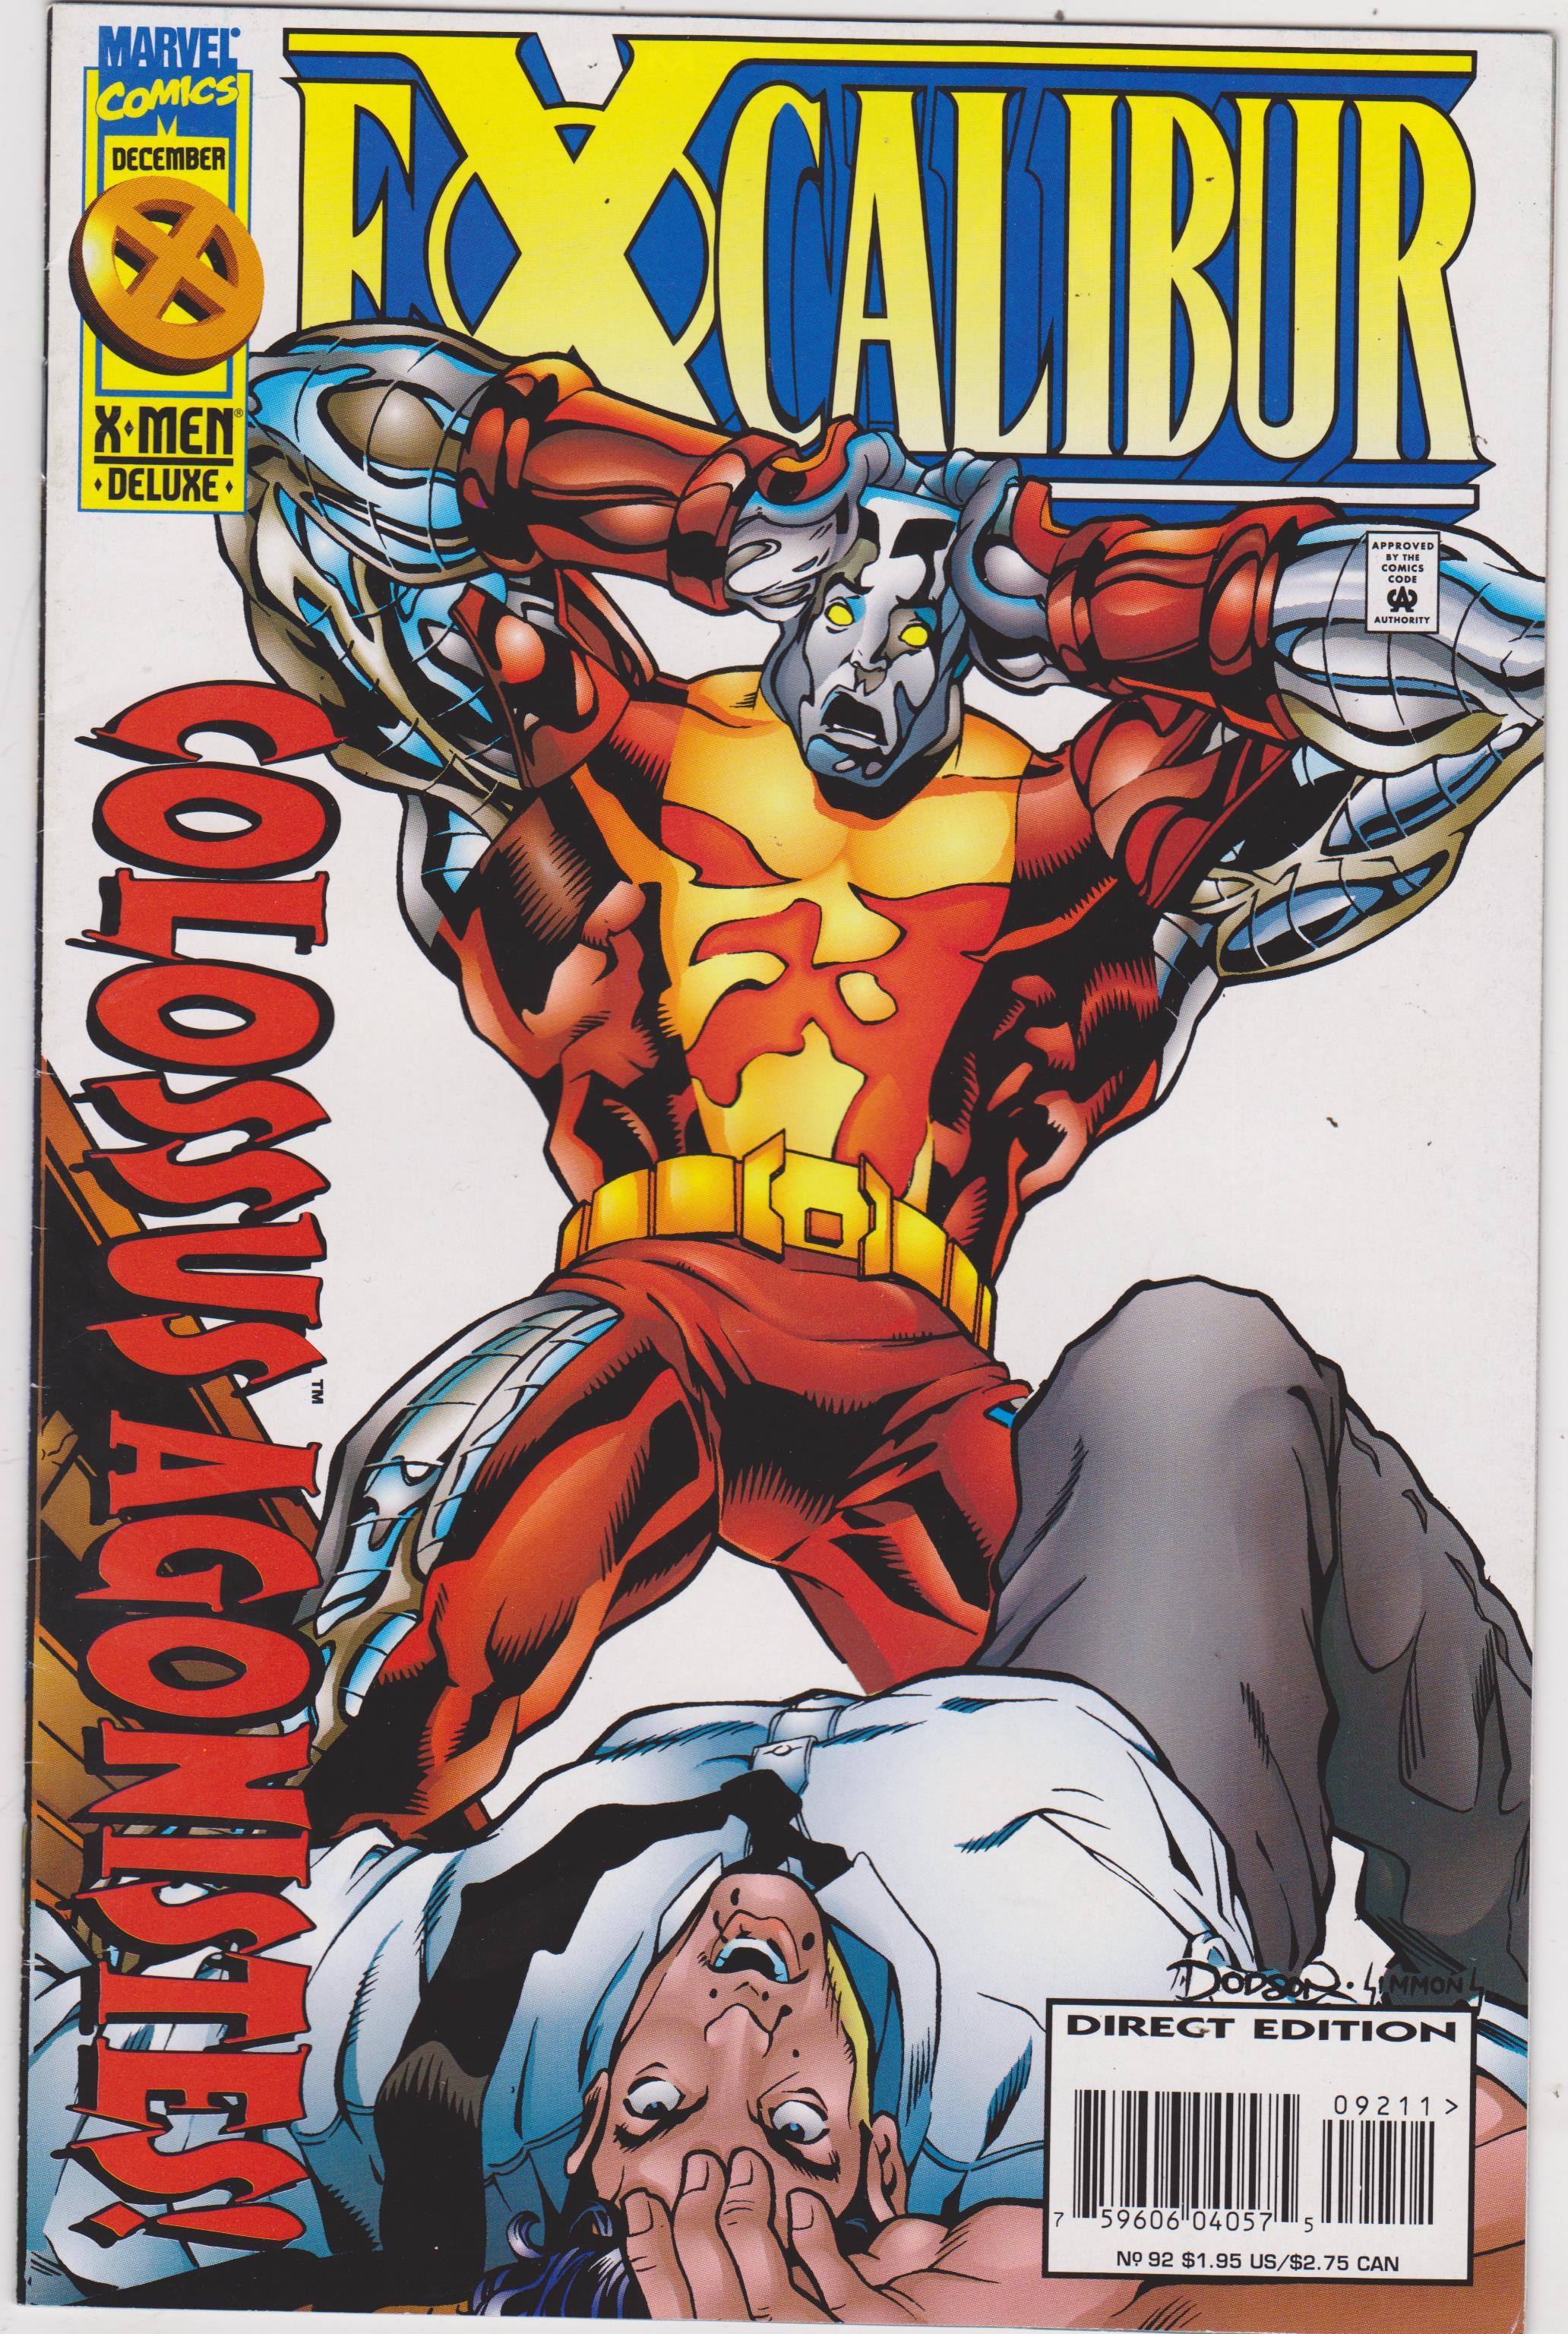 Excalibur 1988 series # 33 very fine comic book